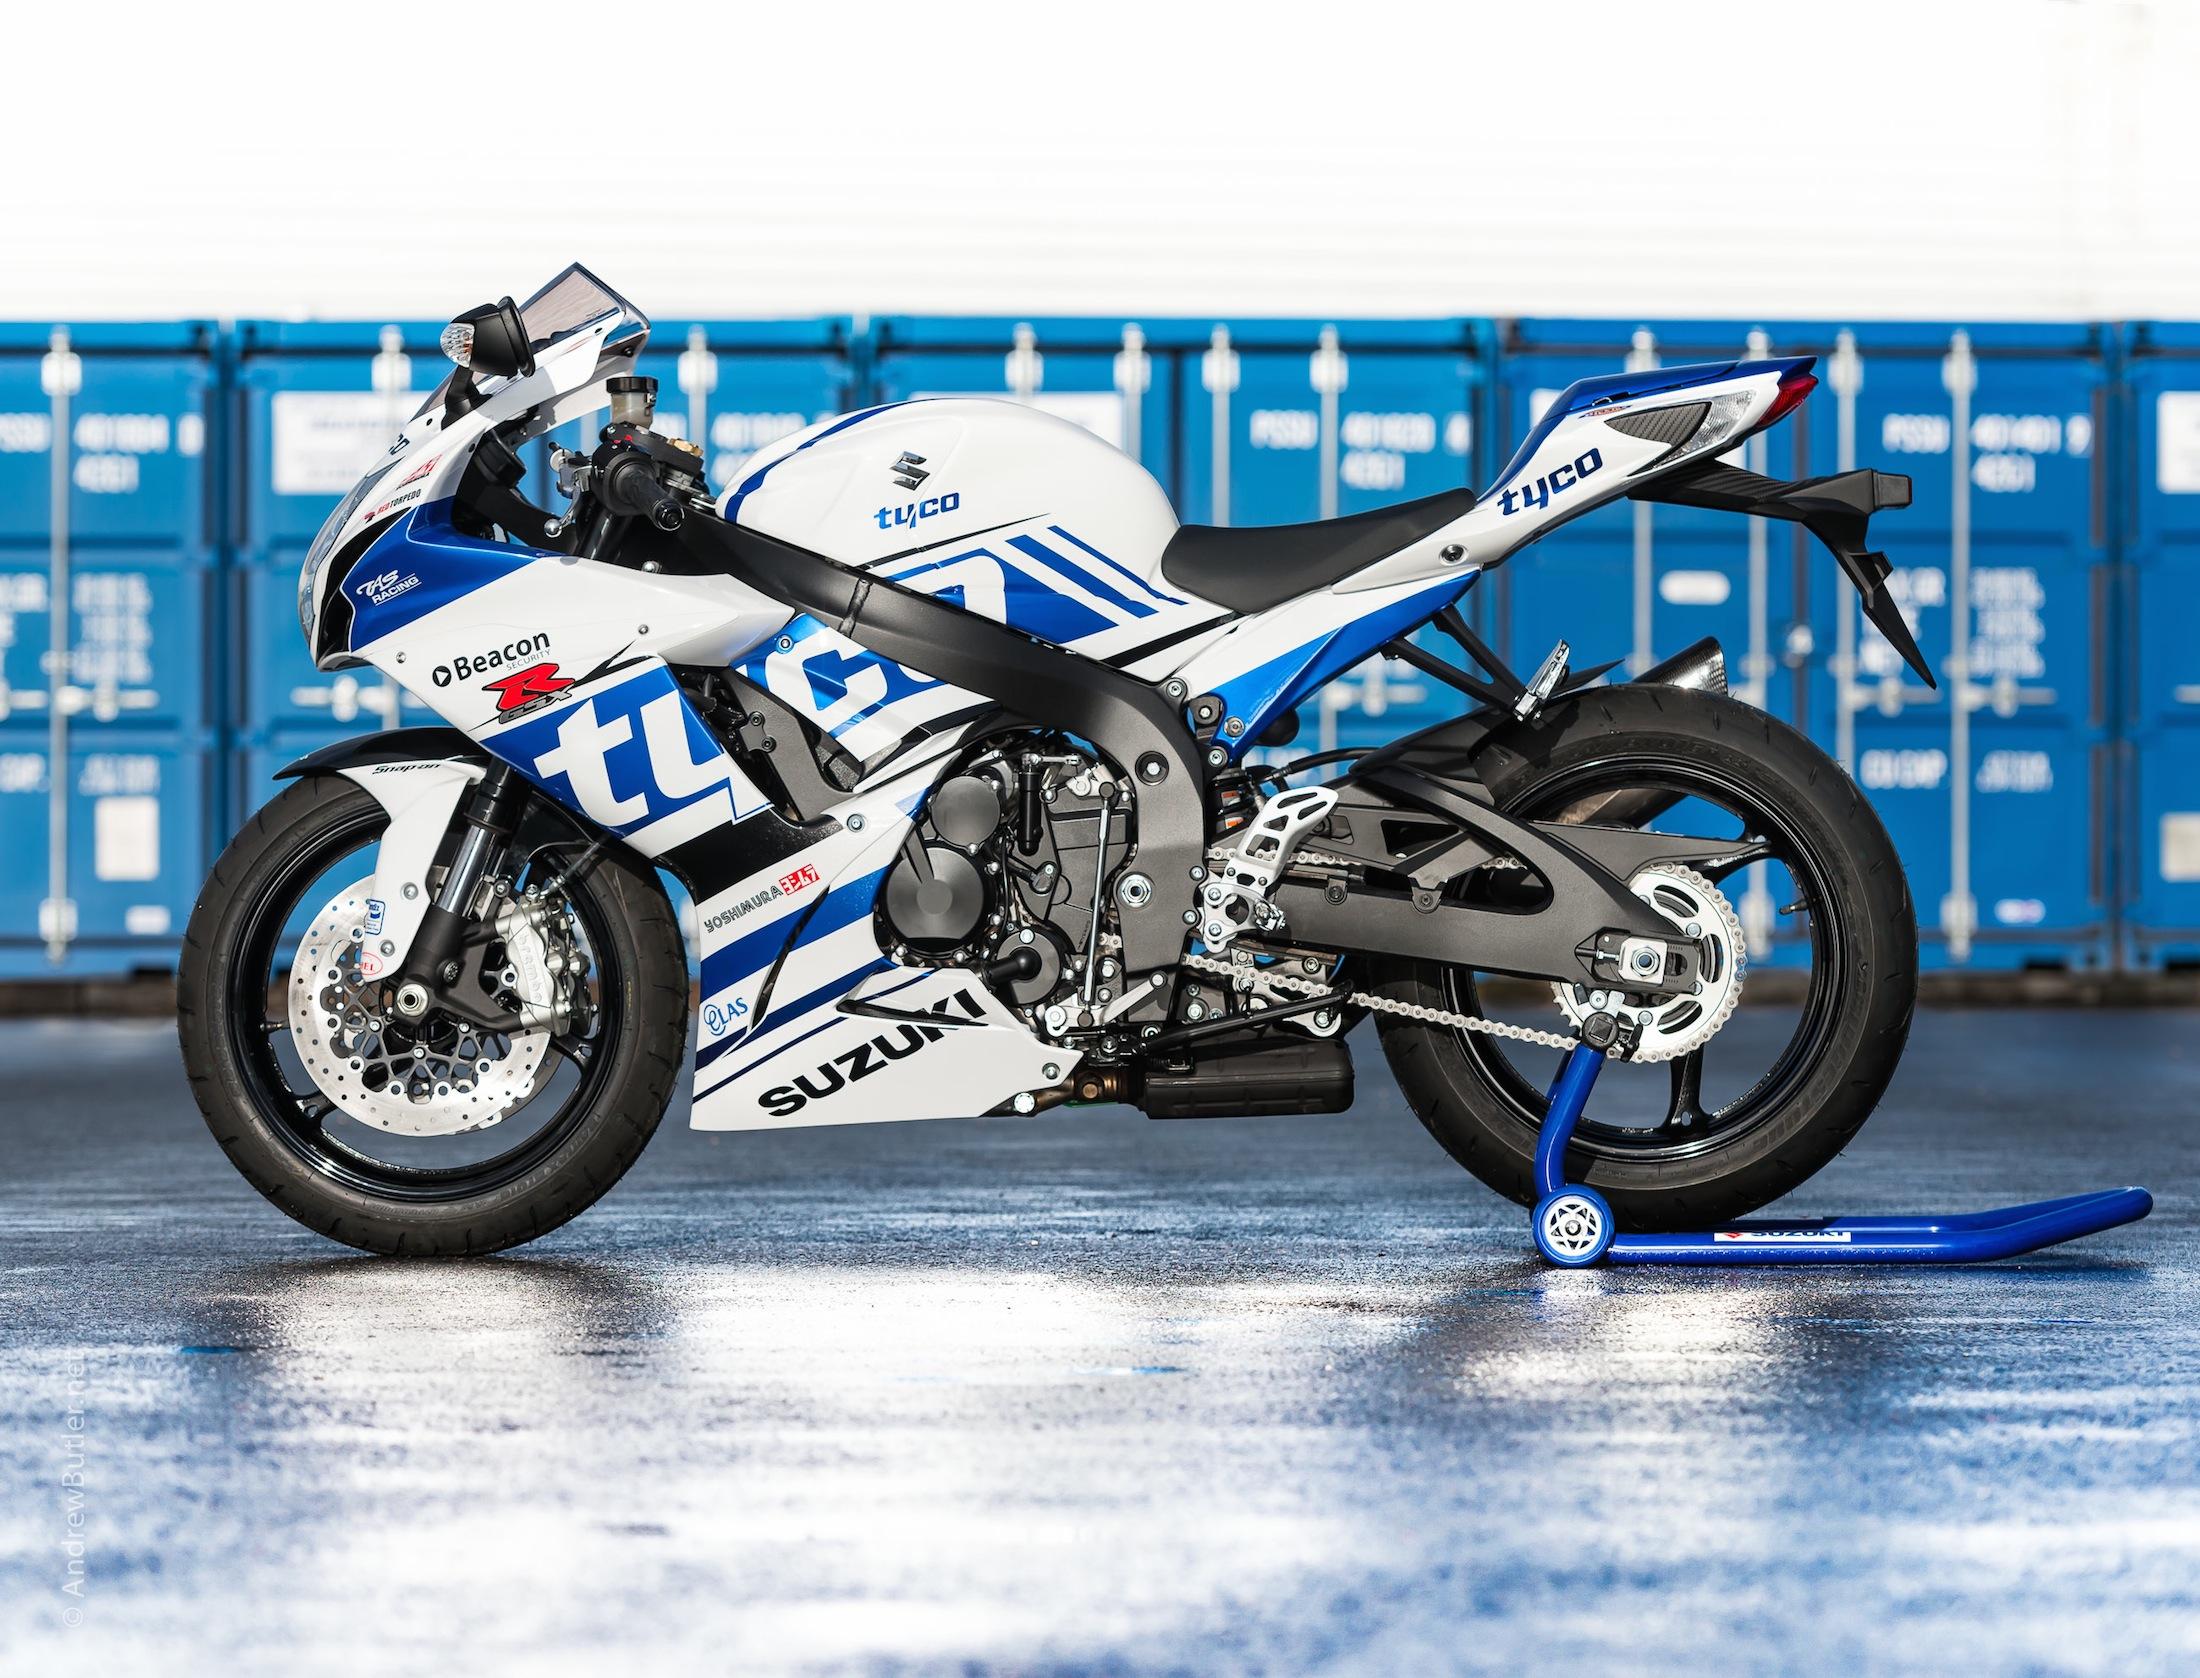 Tyco GSX 600R Suzuki by Andrew Butler by motorbike photographer Andrew Butler